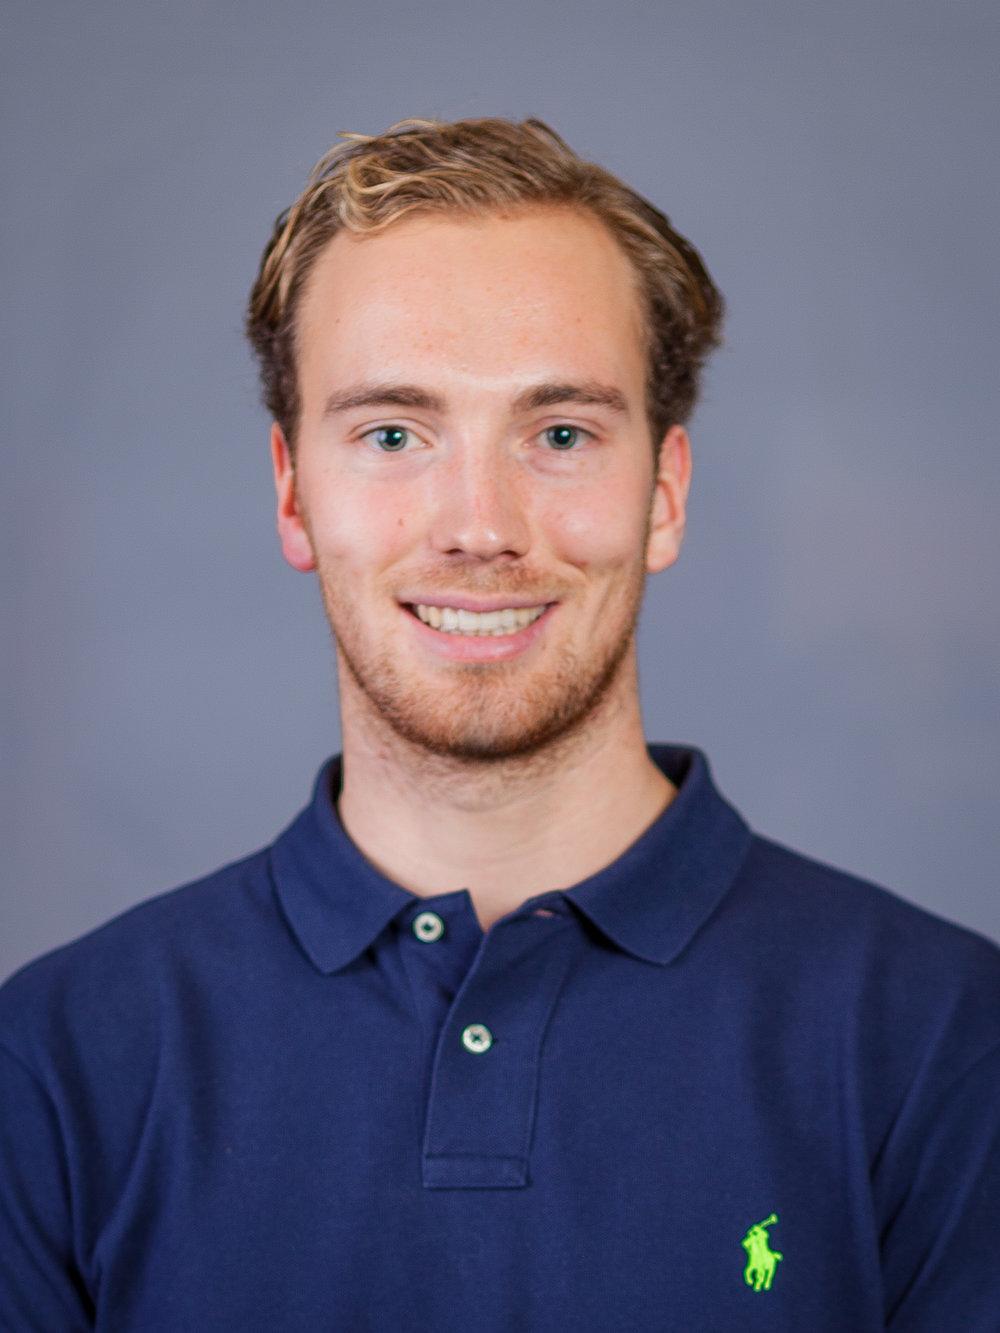 Magnus Aarvold